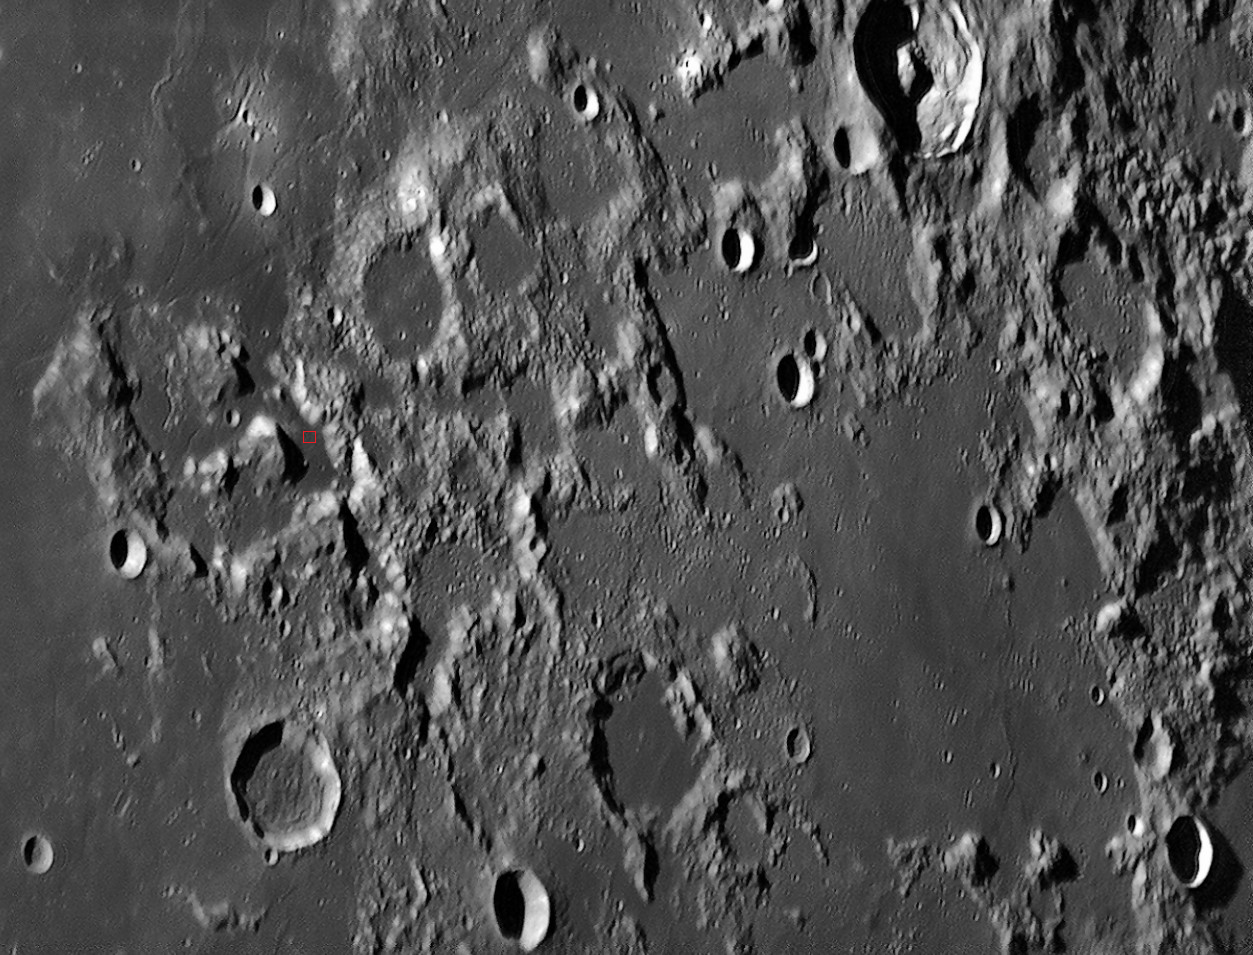 Apollo 17  res 125 2009-09-08 01-18-40.png